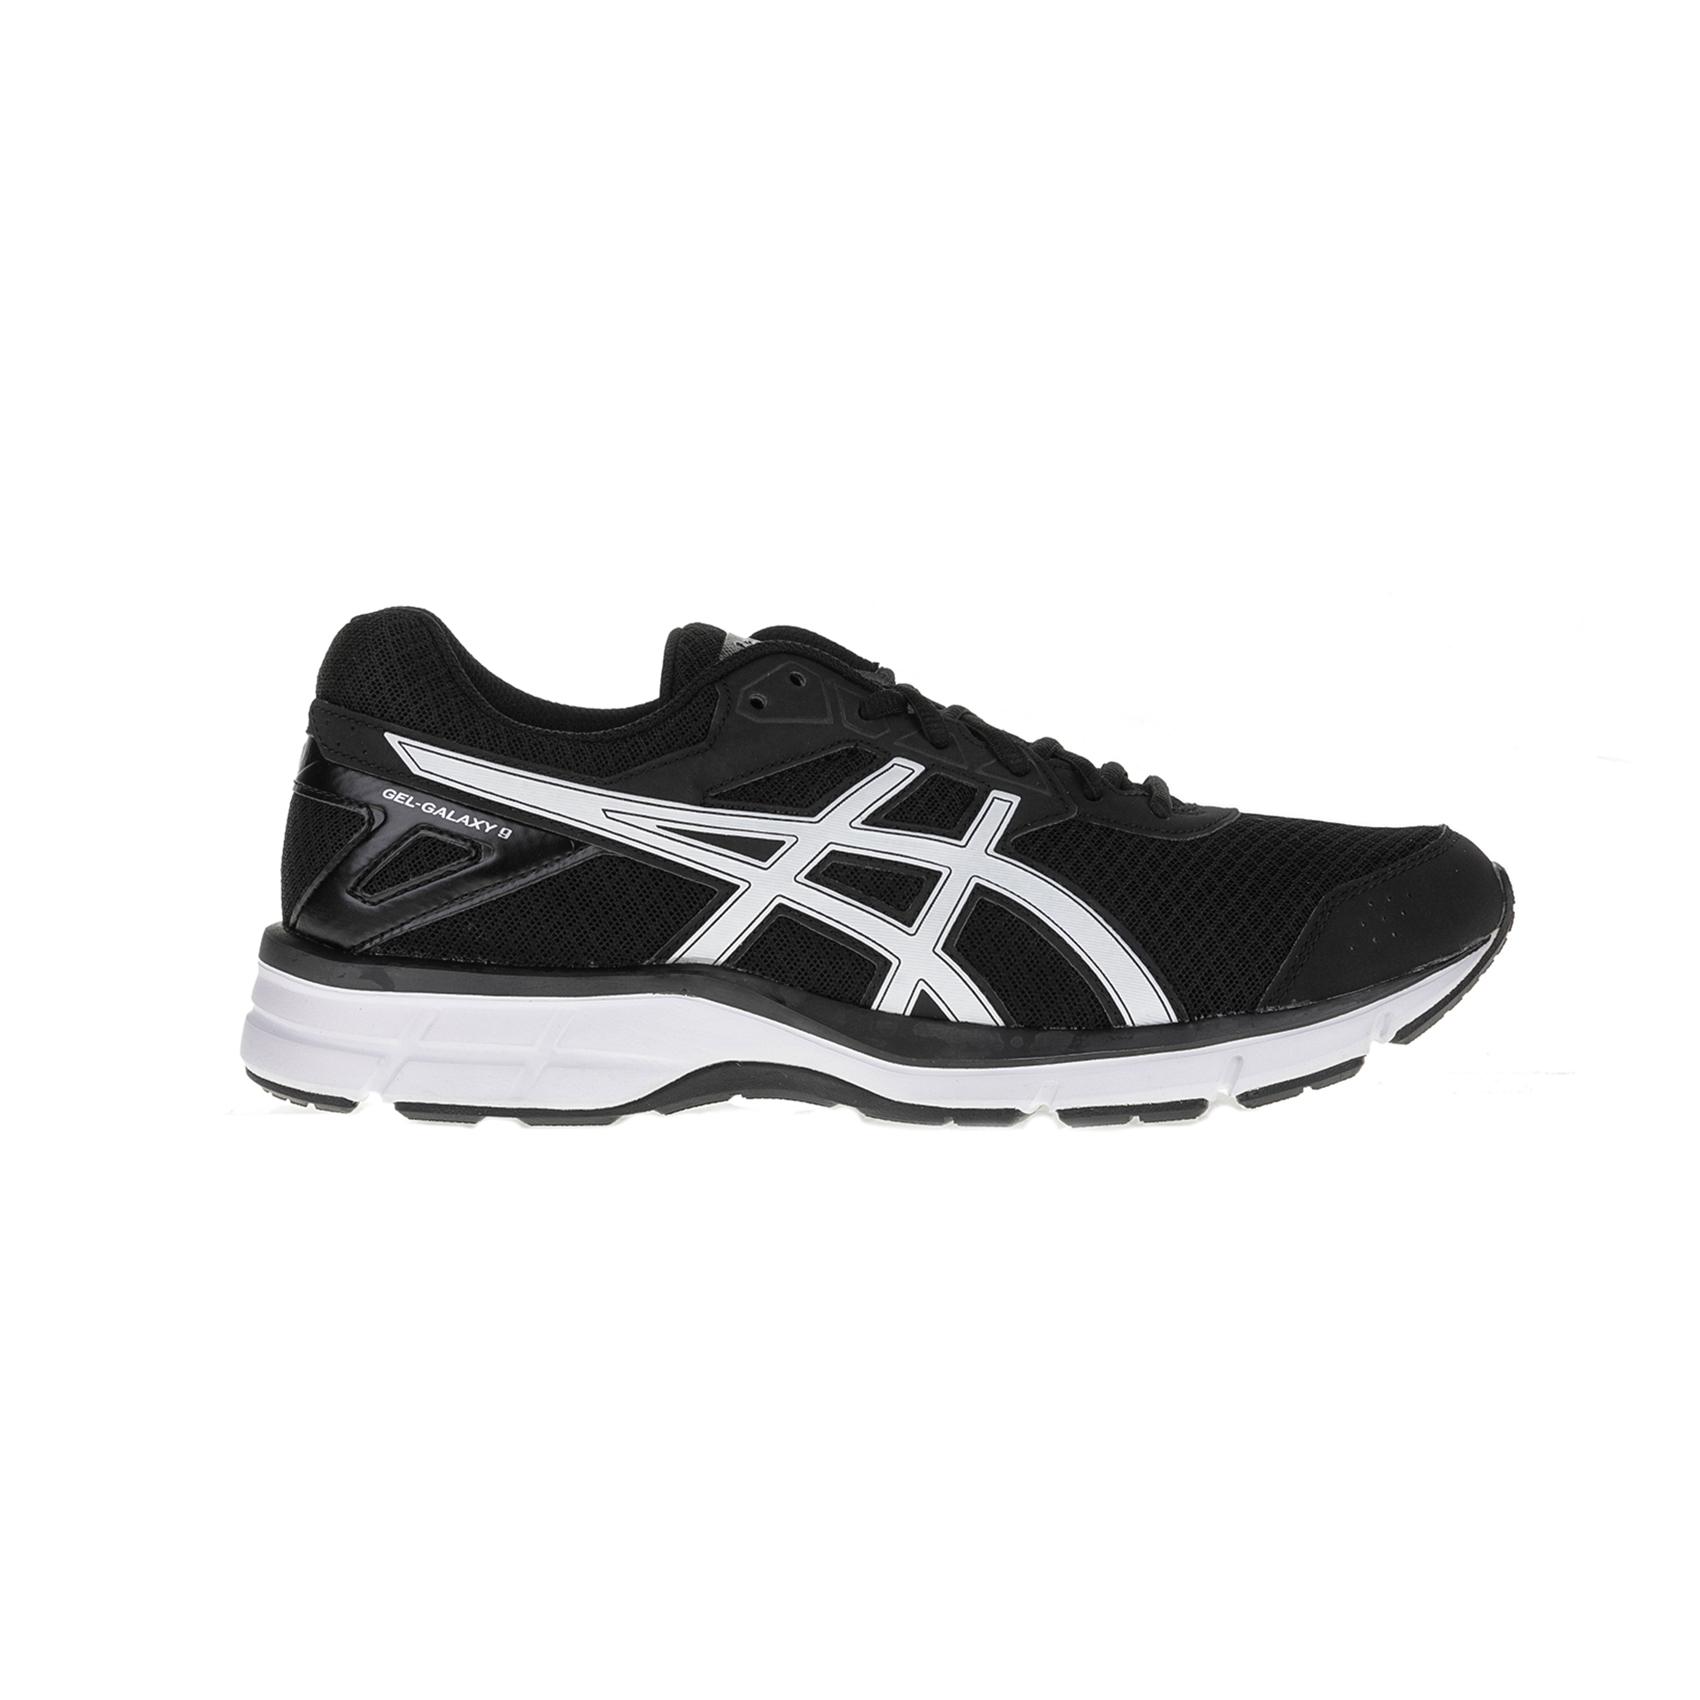 ASICS - Ανδρικά αθλητικά παπούτσια ASICS GEL-GALAXY 9 μαύρα ανδρικά παπούτσια αθλητικά running